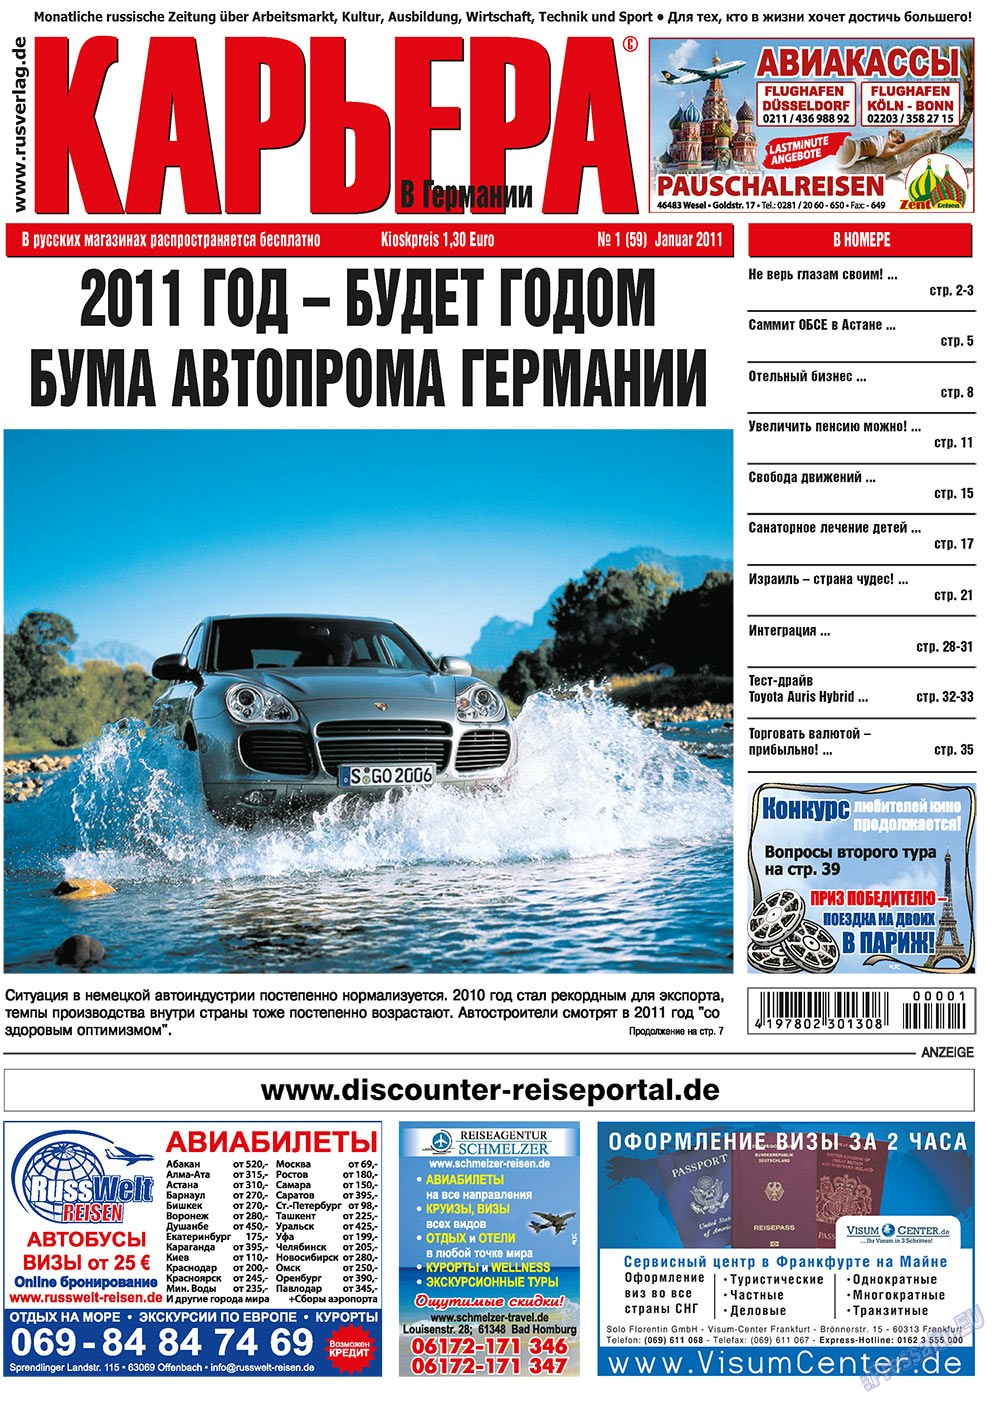 Карьера (газета). 2011 год, номер 1, стр. 1